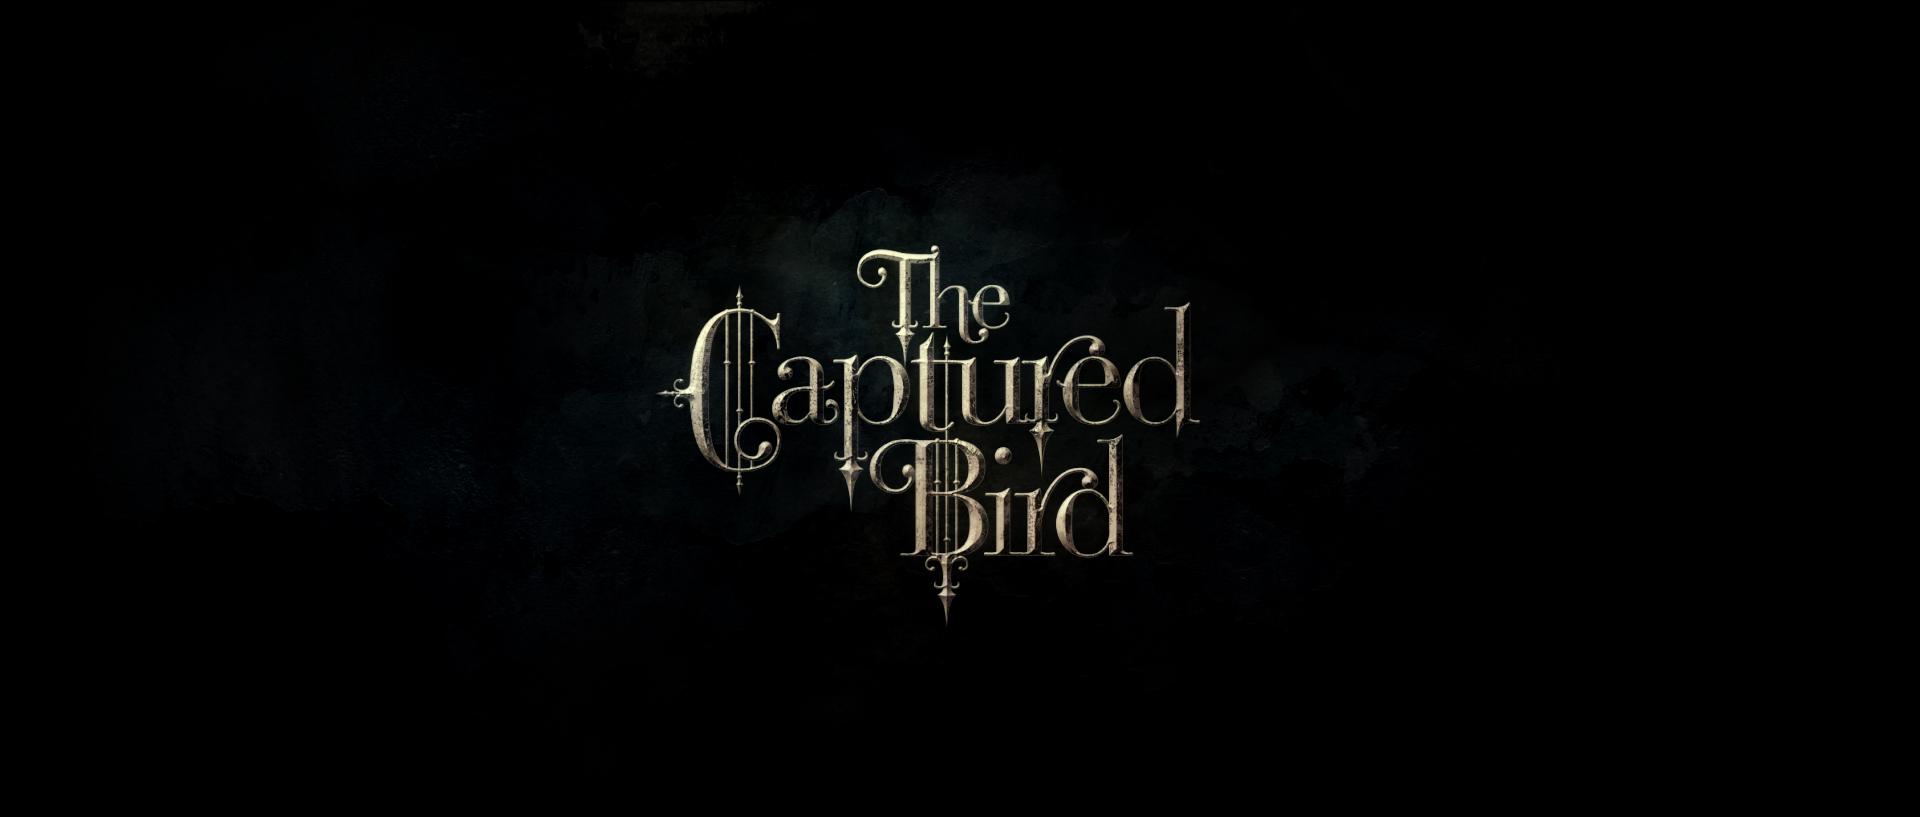 TheCapturedBird_00002.jpg